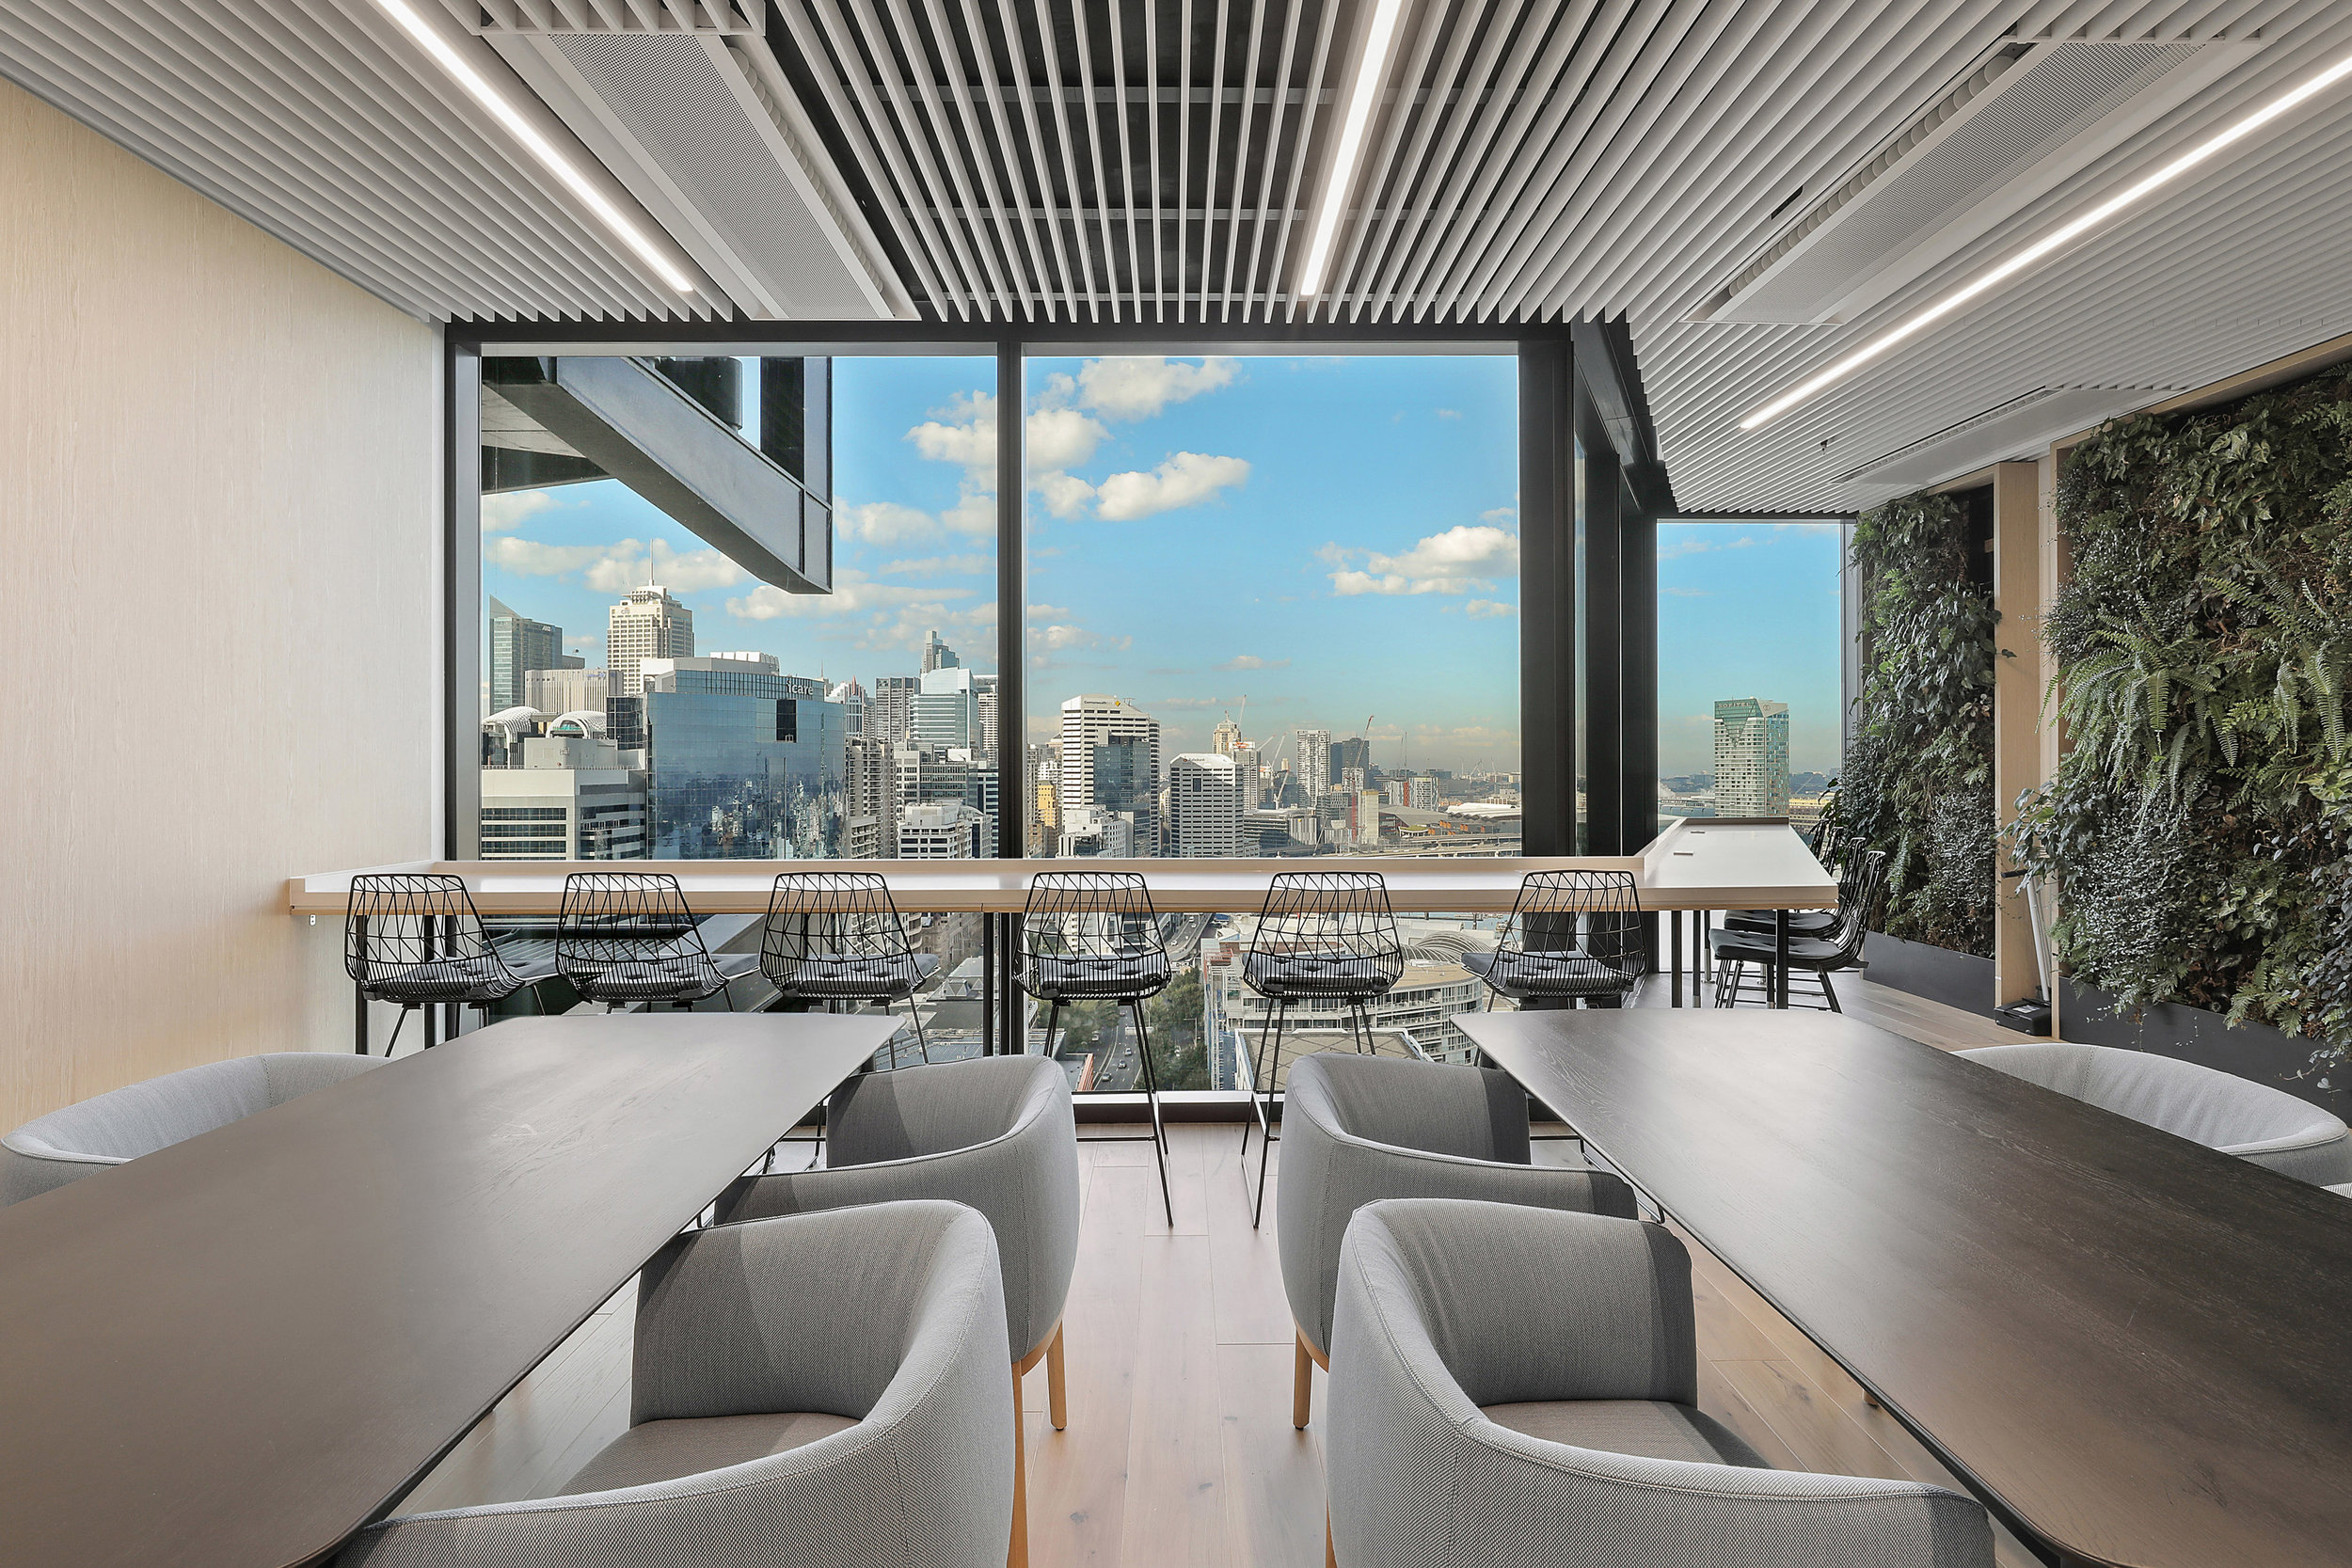 CMC_Markets_L20_3_International_Towers_Barangaroo_High_Coffee_Area.jpg